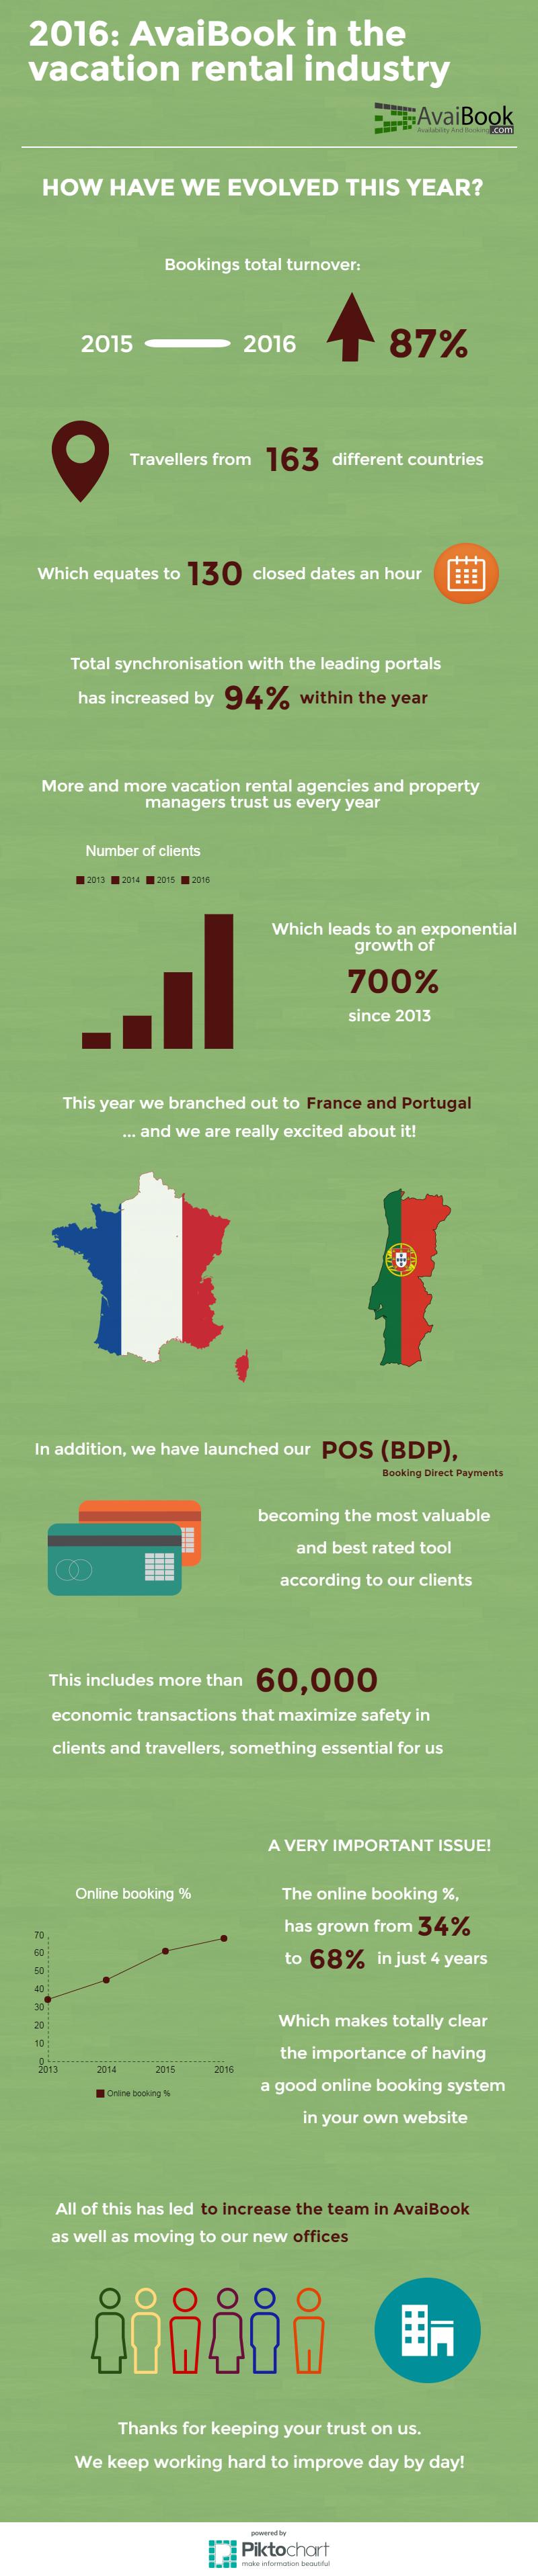 avaibook infographic